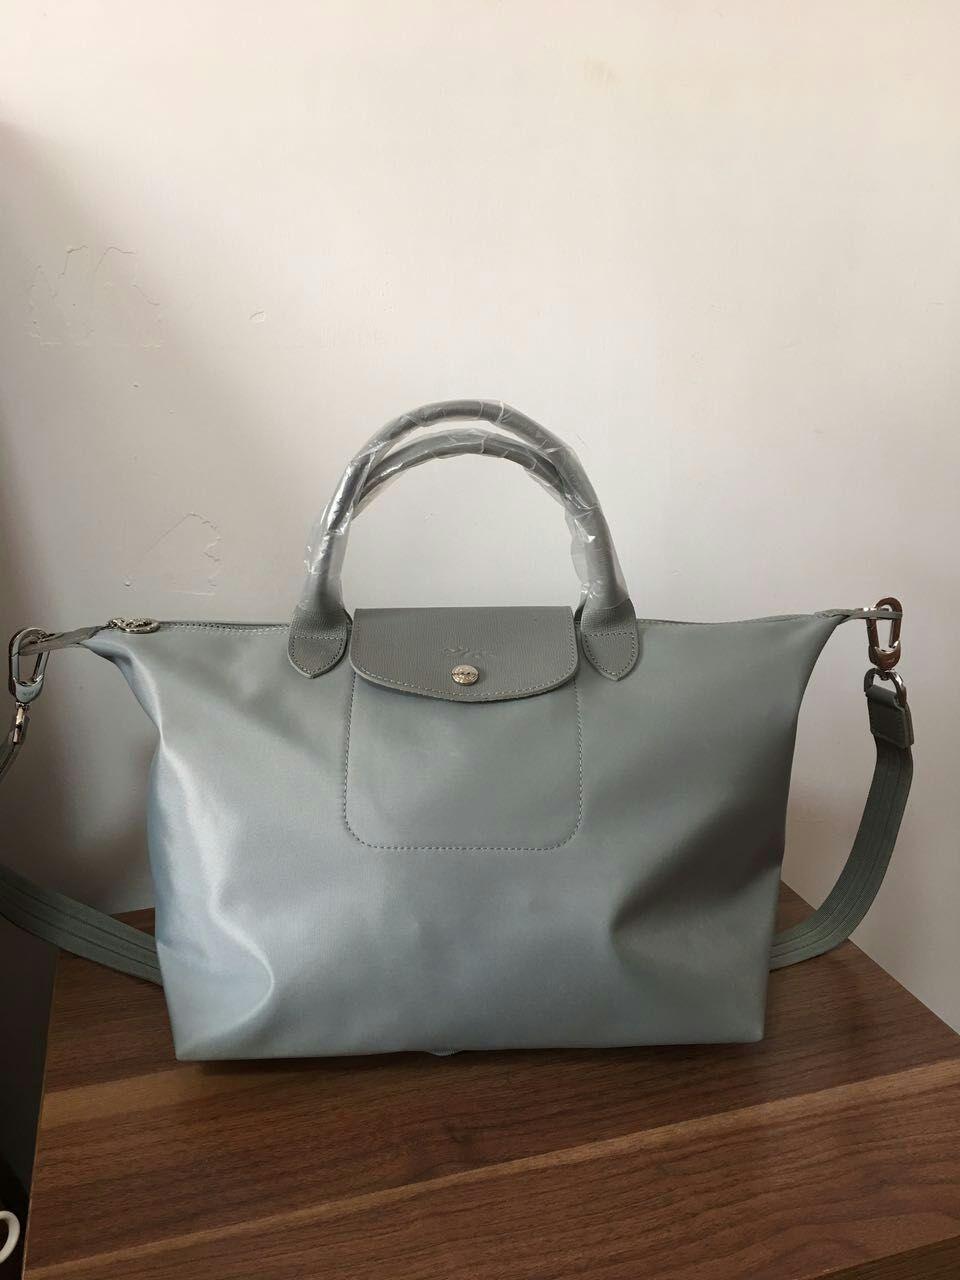 cf6cc6d2fd2 Longchamp Le Pliage Neo Medium Handbag Pebble Galet 1515578274 - $135.00 -  $165.00